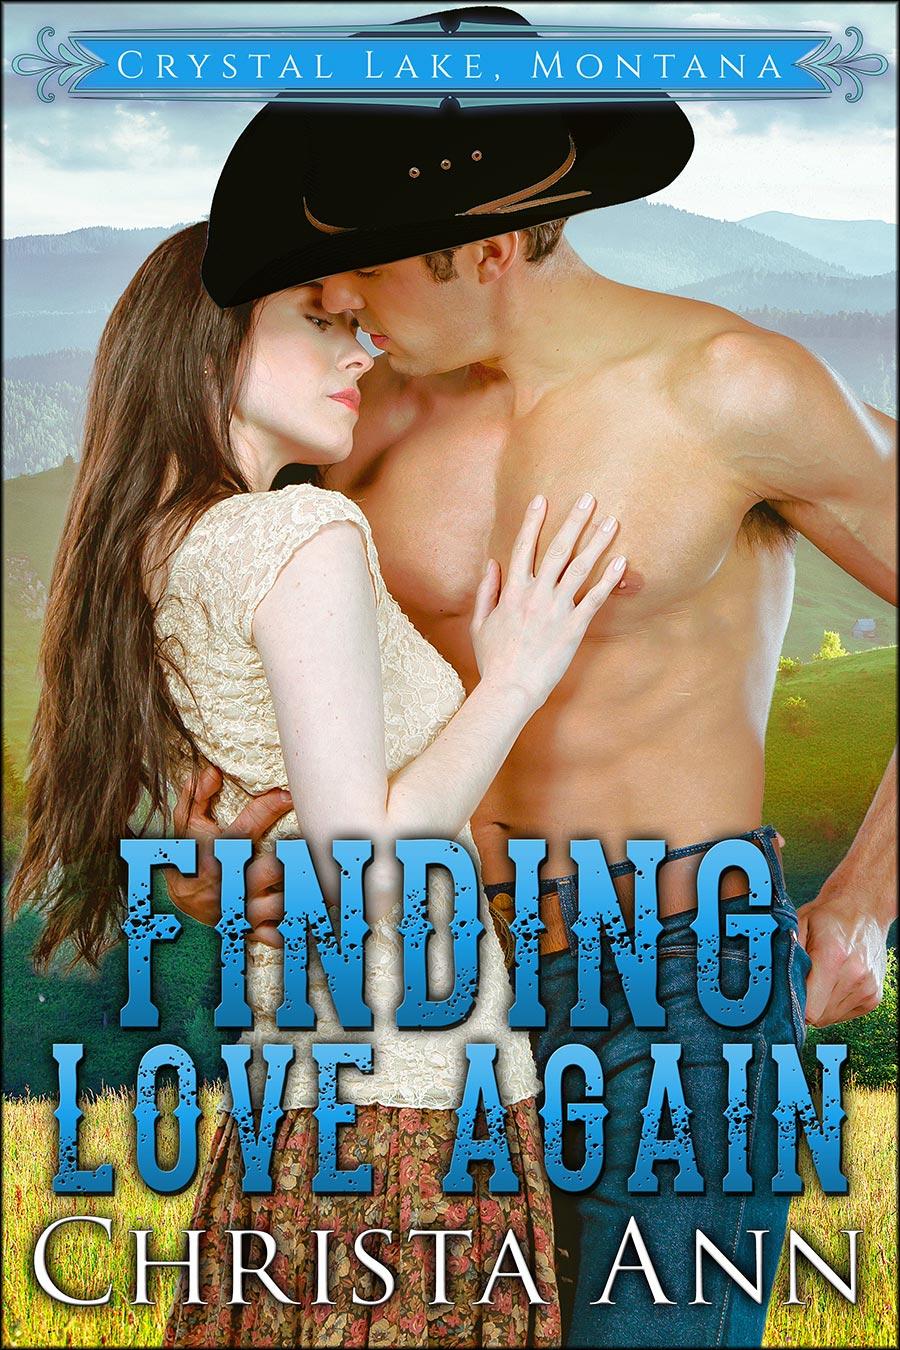 Finding-Love-Again-by-Christa-Ann---black-hat-draft.jpg